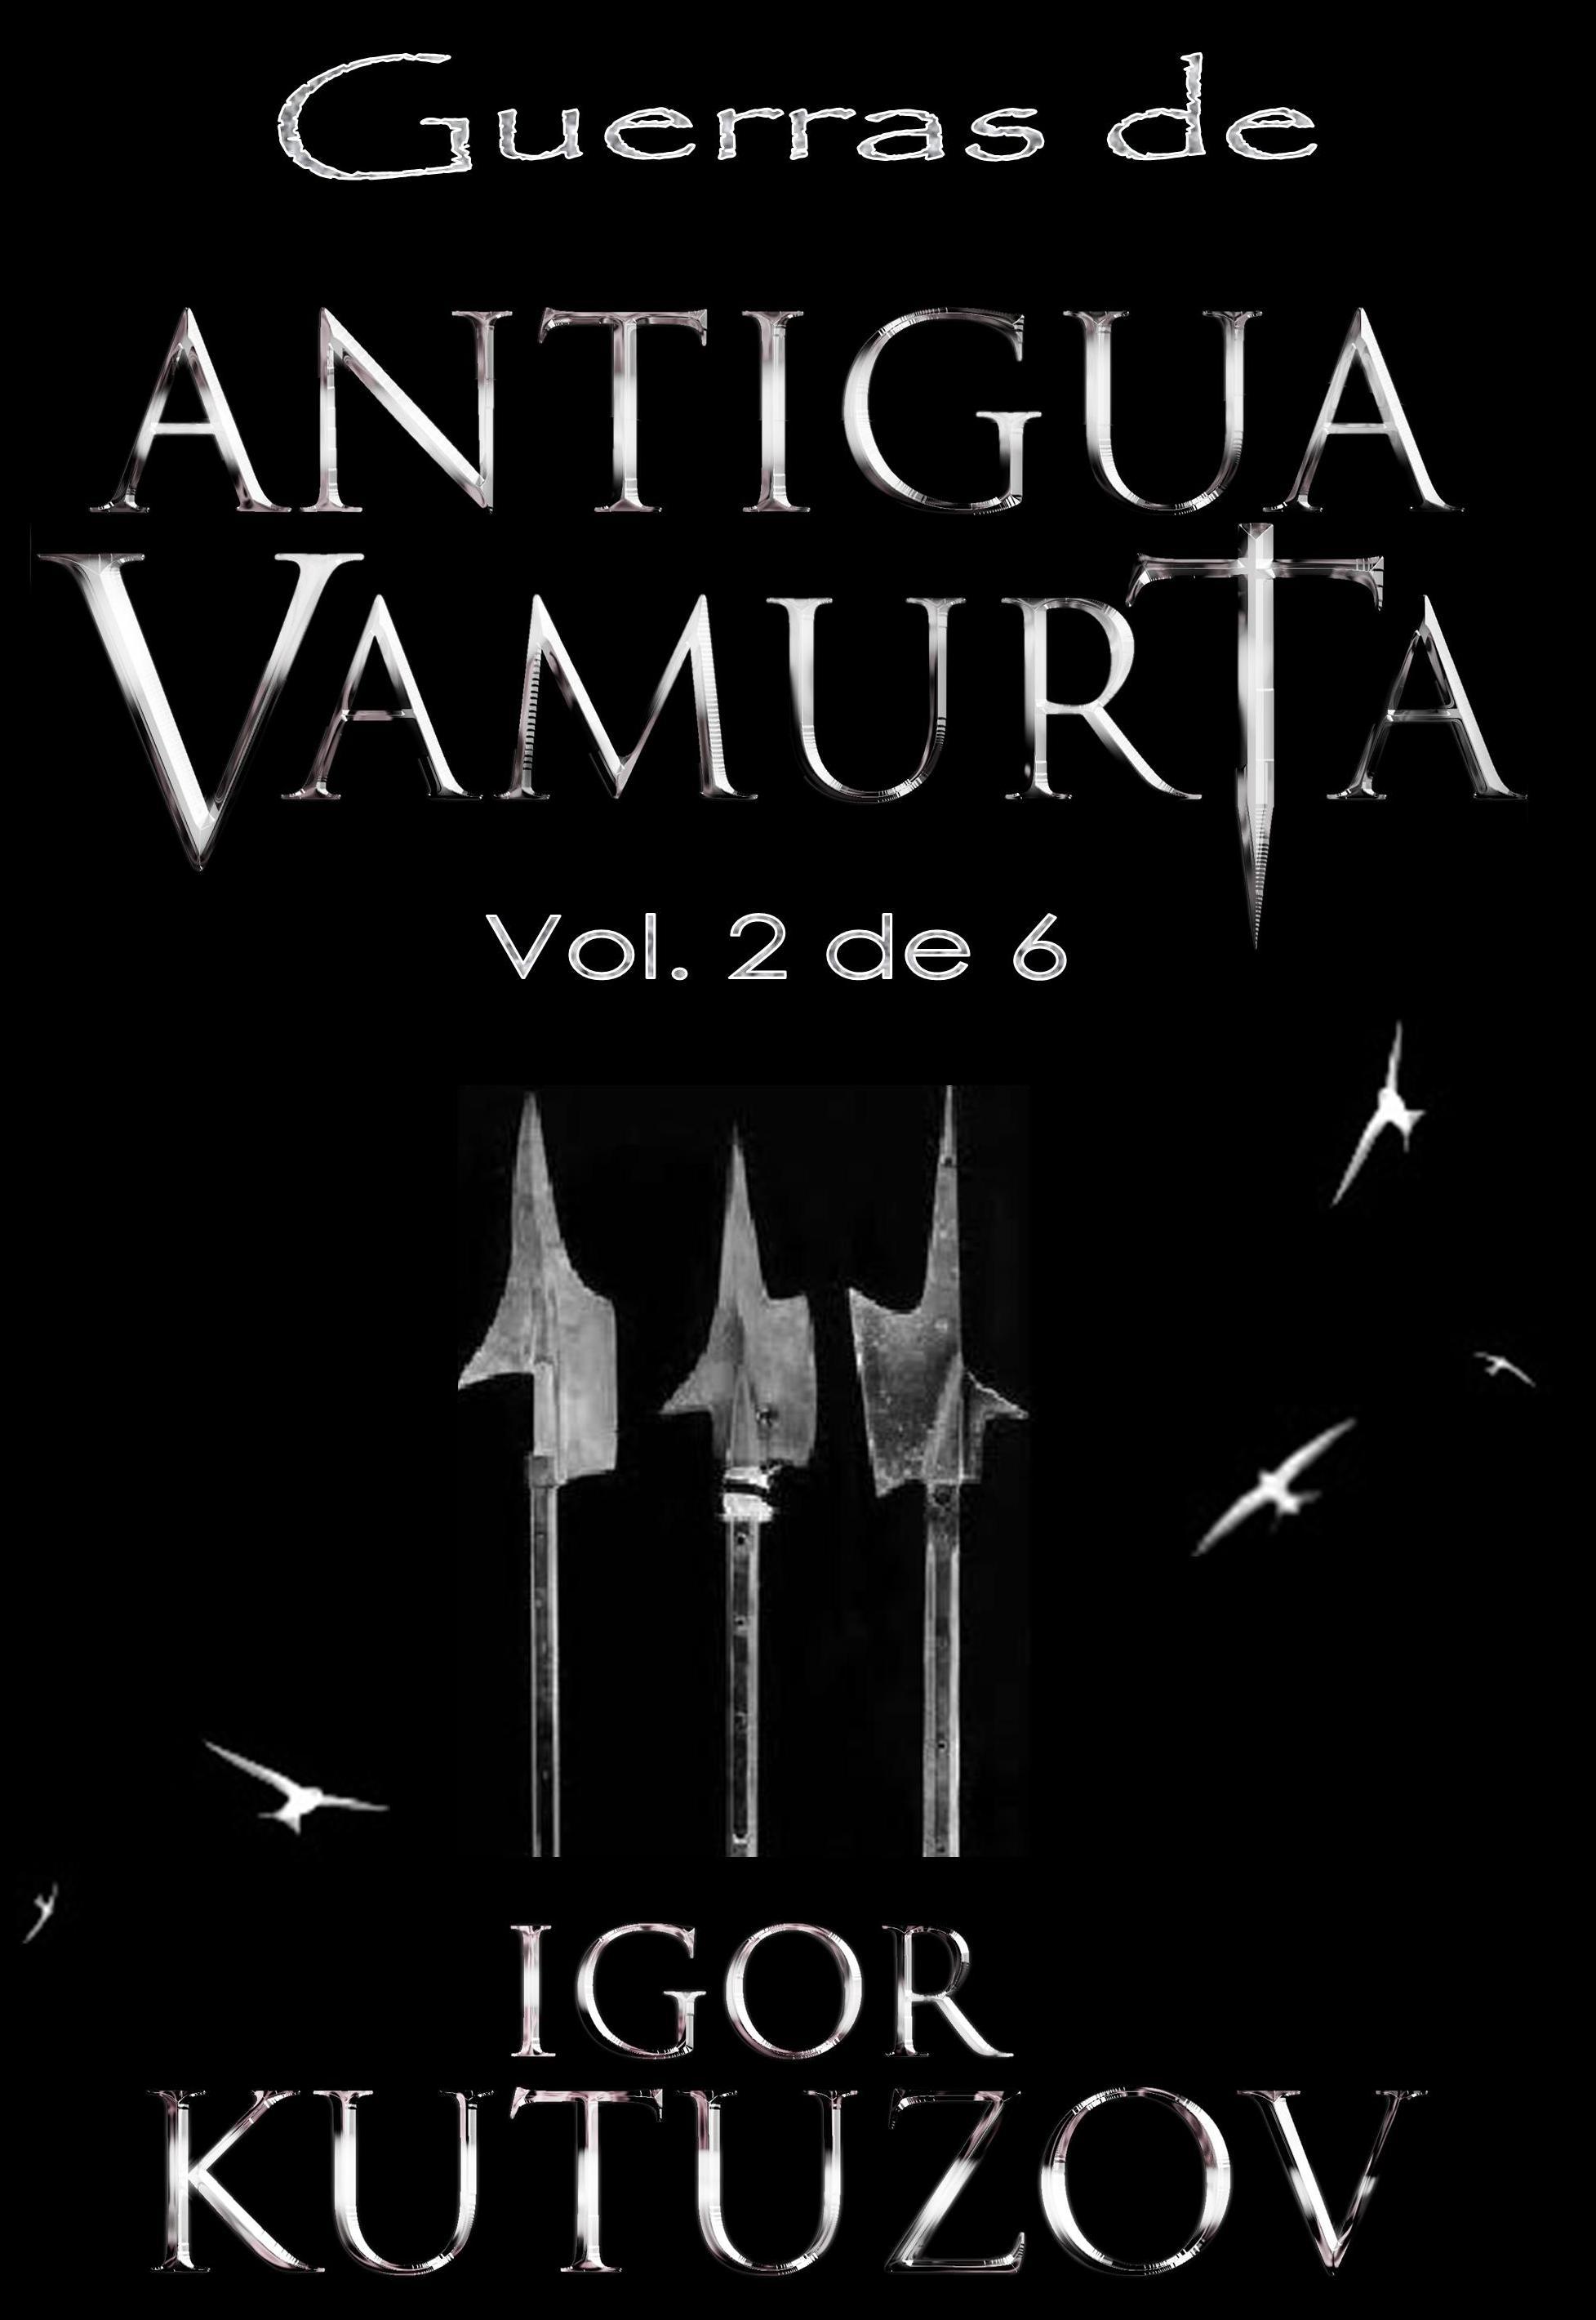 Novela fantástica, novela épica gratis